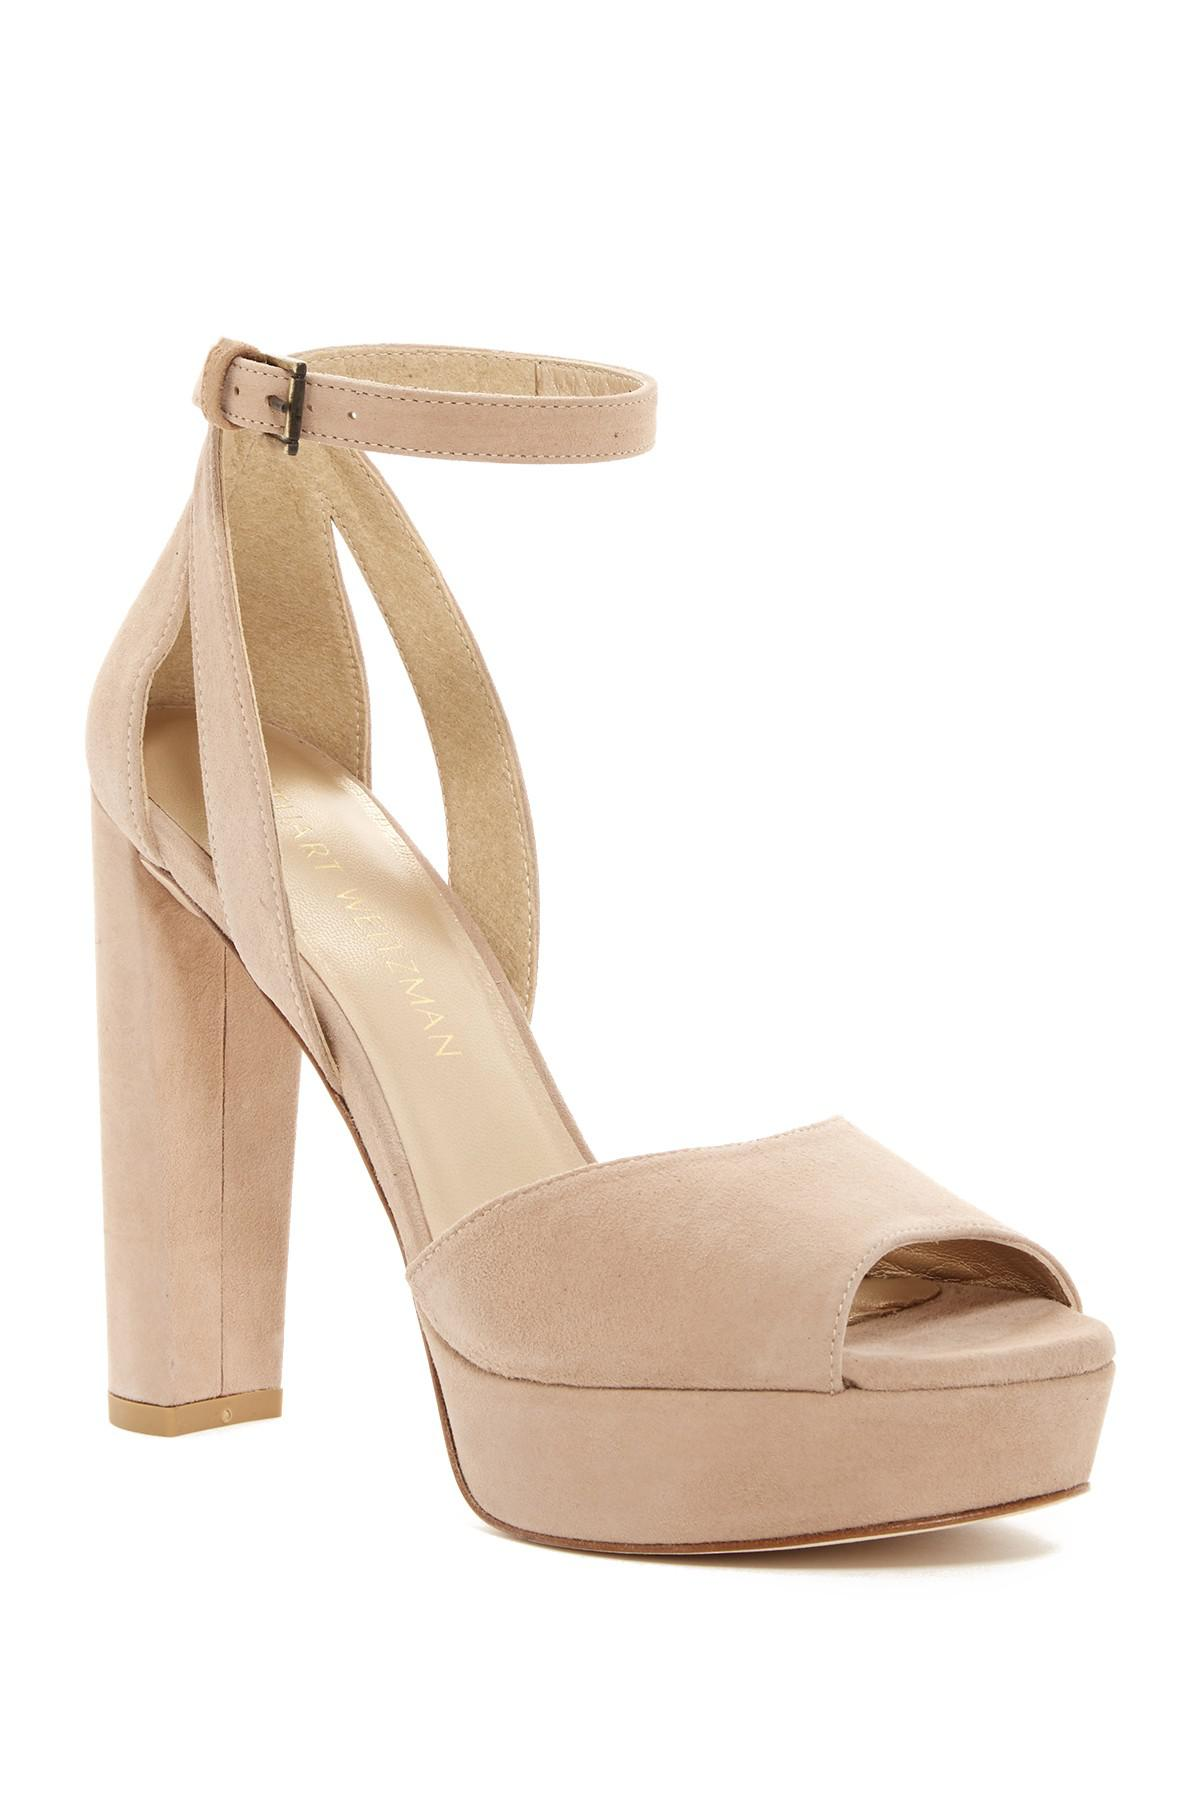 59860ef8fe4 Lyst - Stuart Weitzman  hijinx  Platform Sandal (women) in Natural